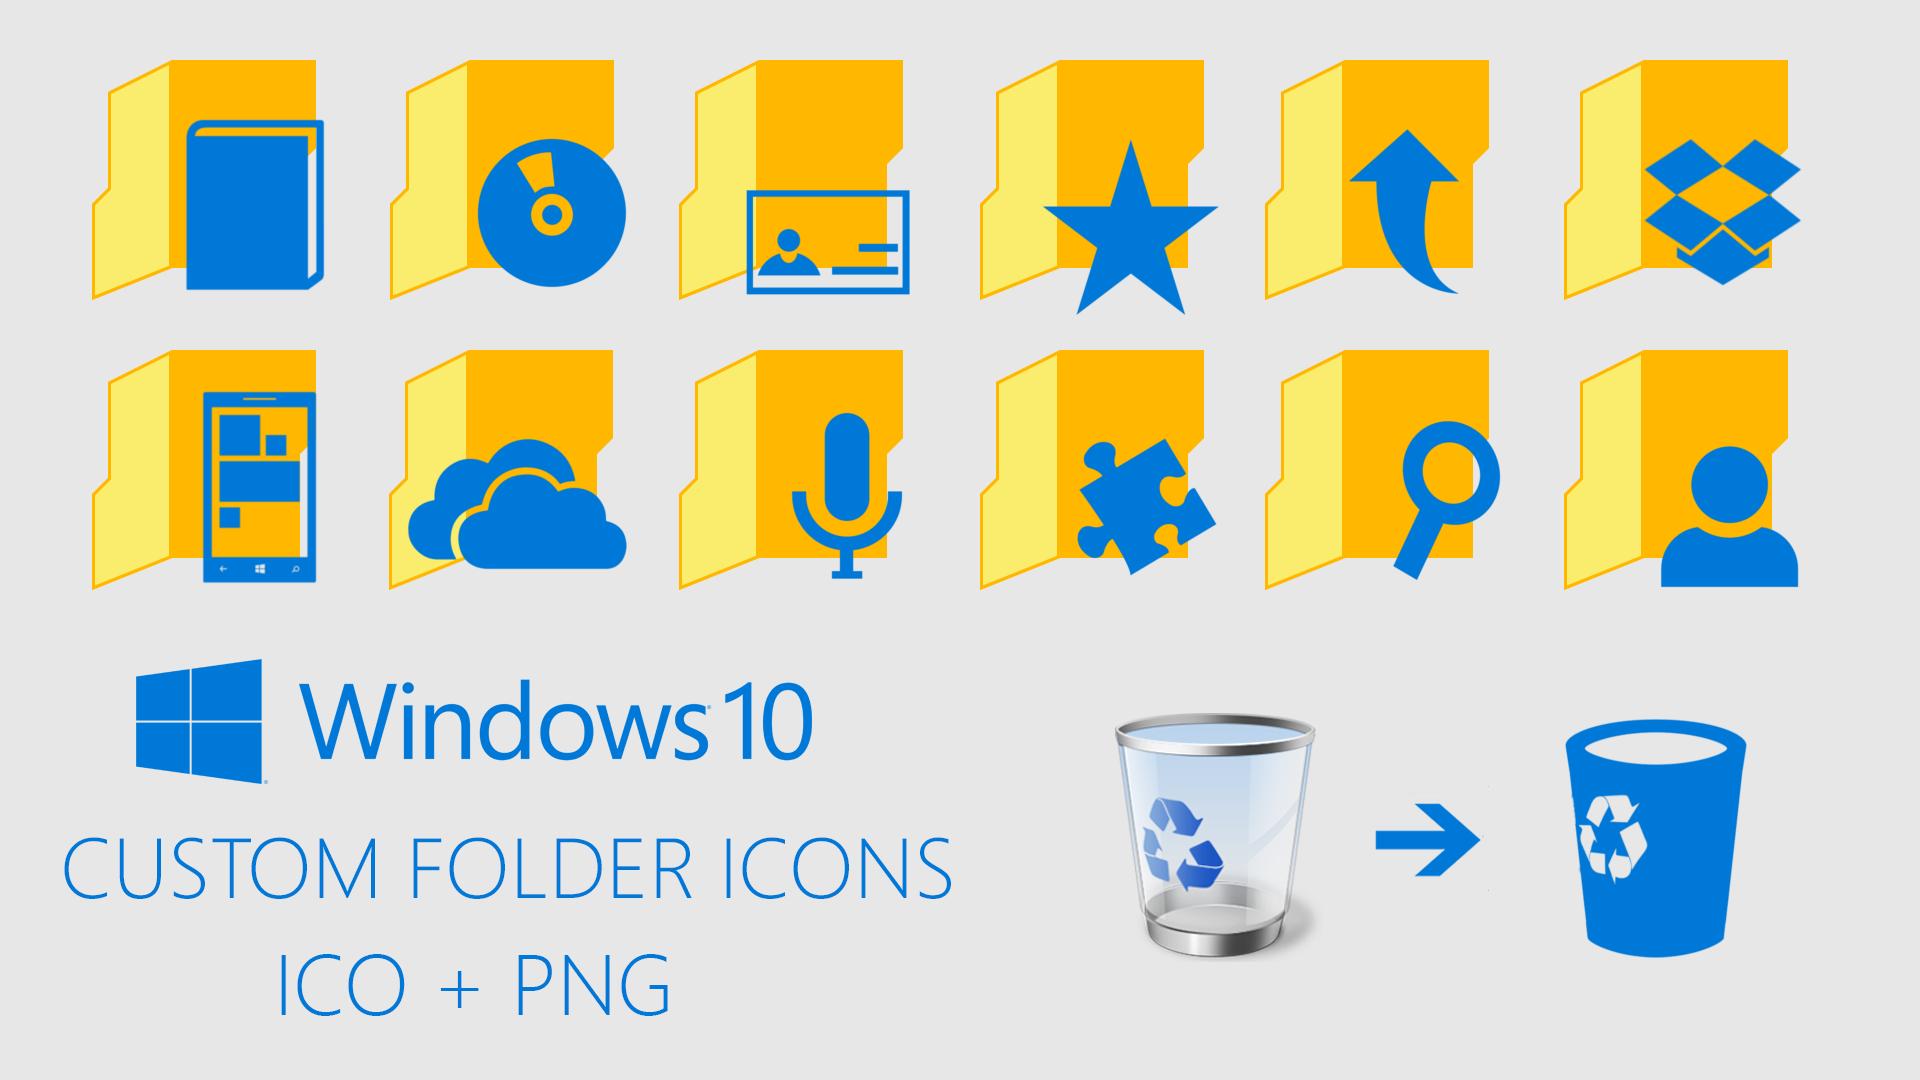 Windows 10 Custom Folder Icons by davidvkimball on DeviantArt.